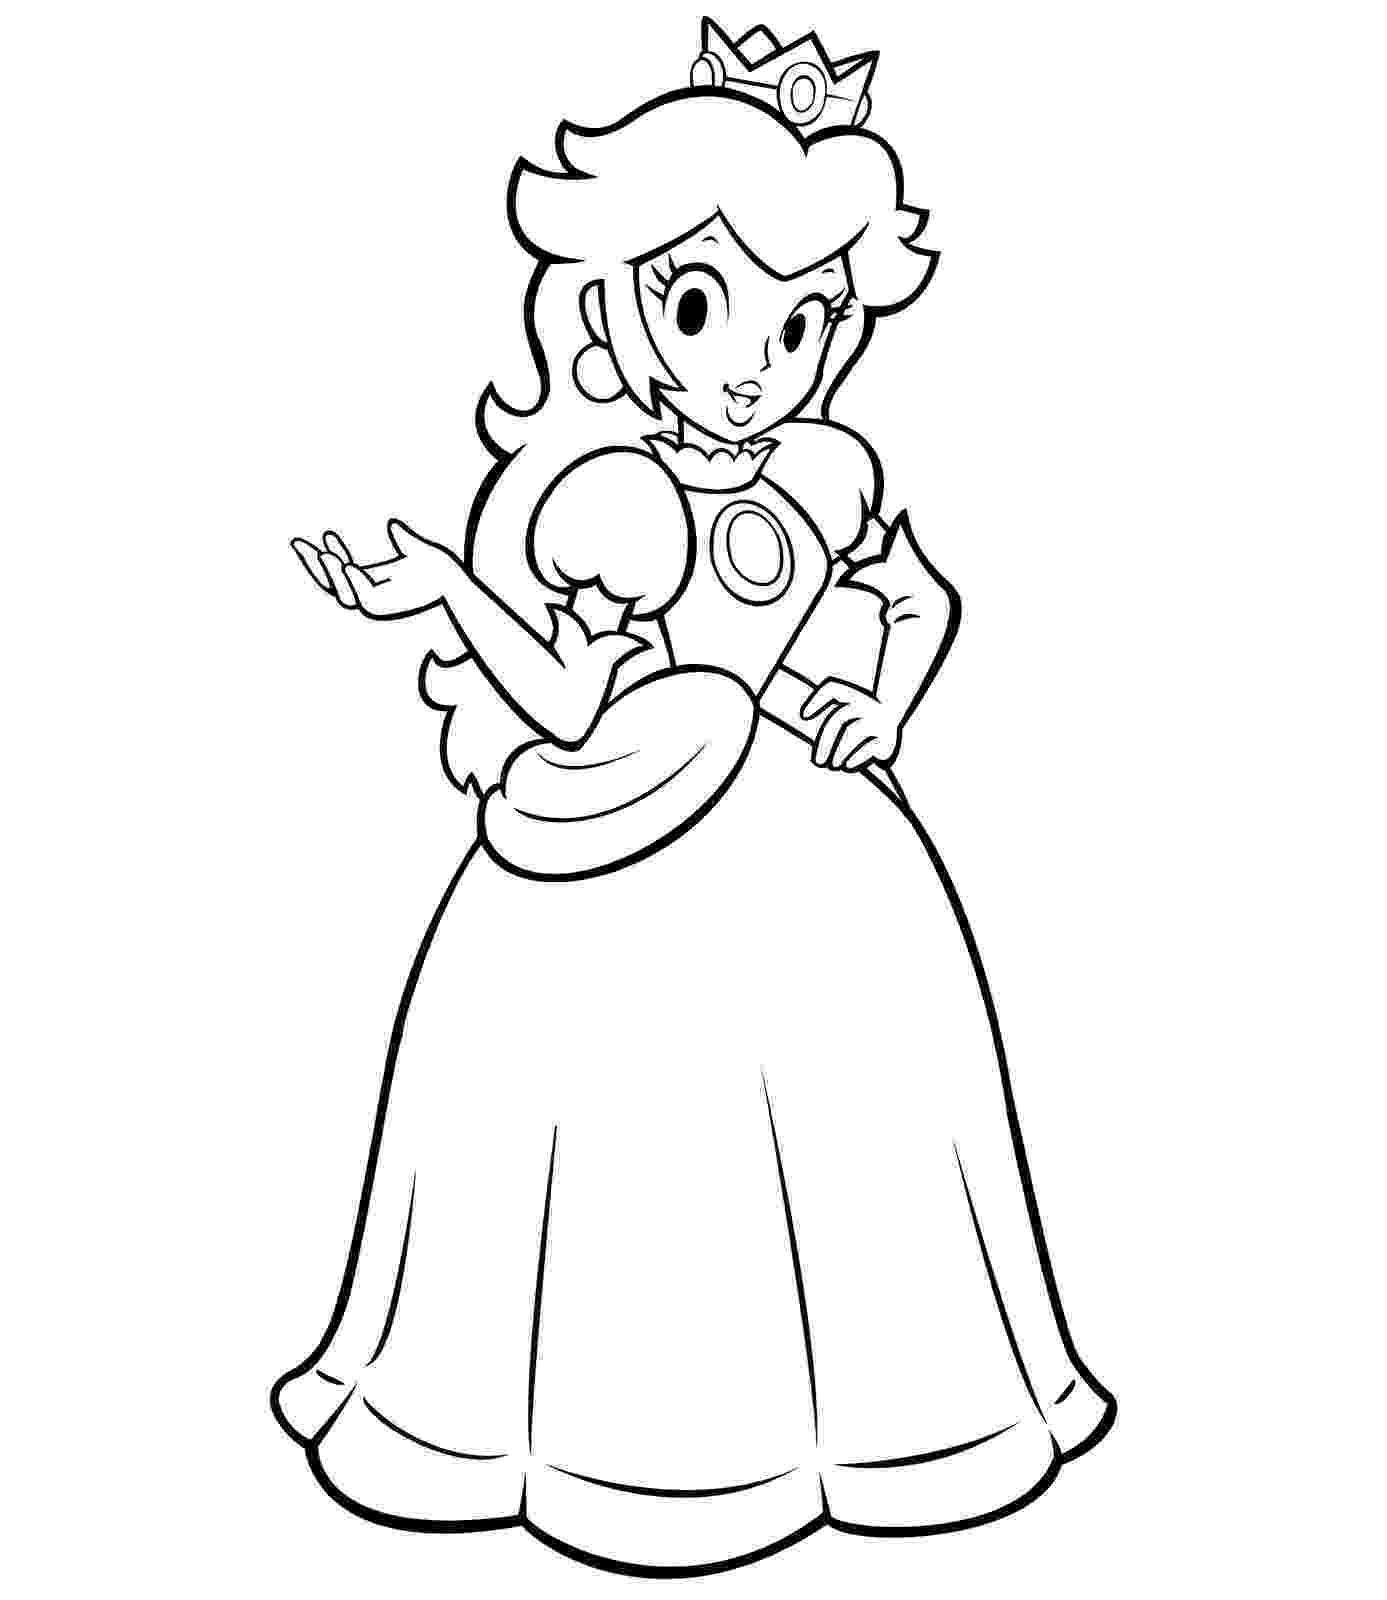 princess coloring pages online disney princess coloring pages minister coloring coloring princess online pages